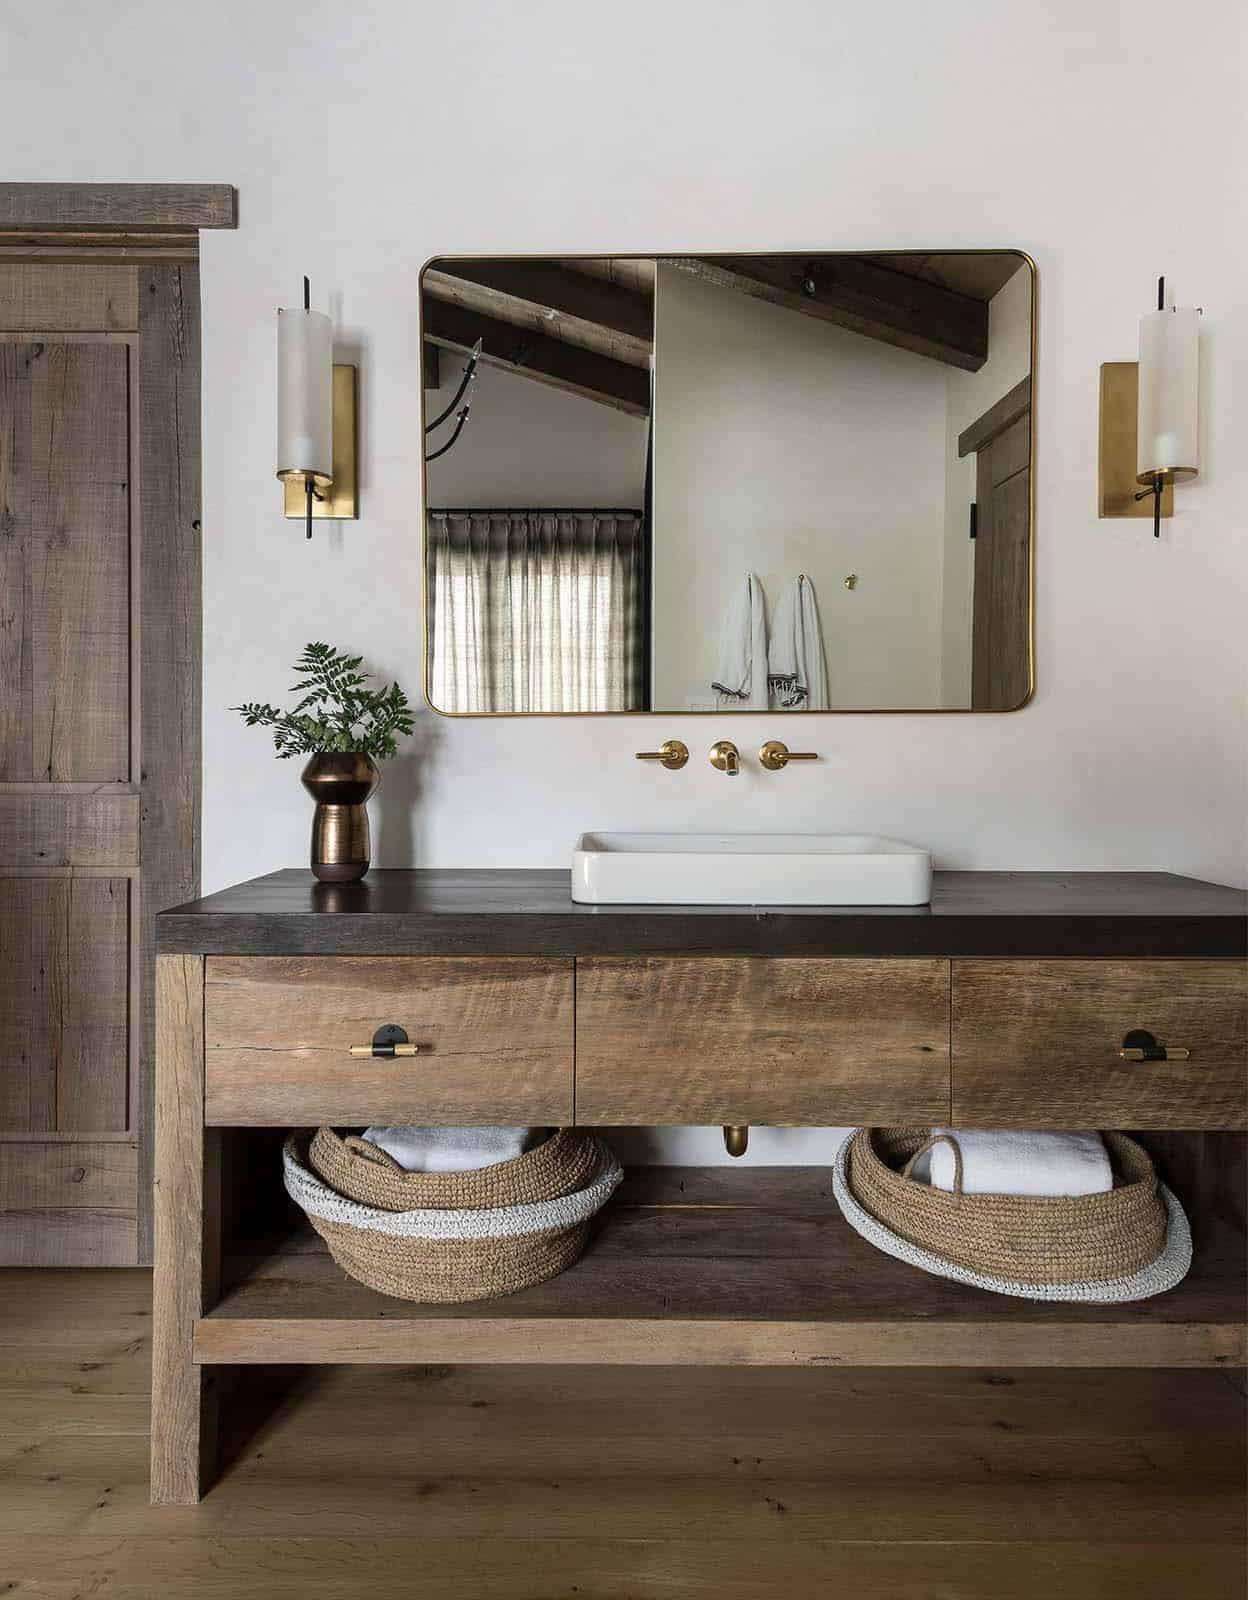 swiss-chalet-inspired-bathroom